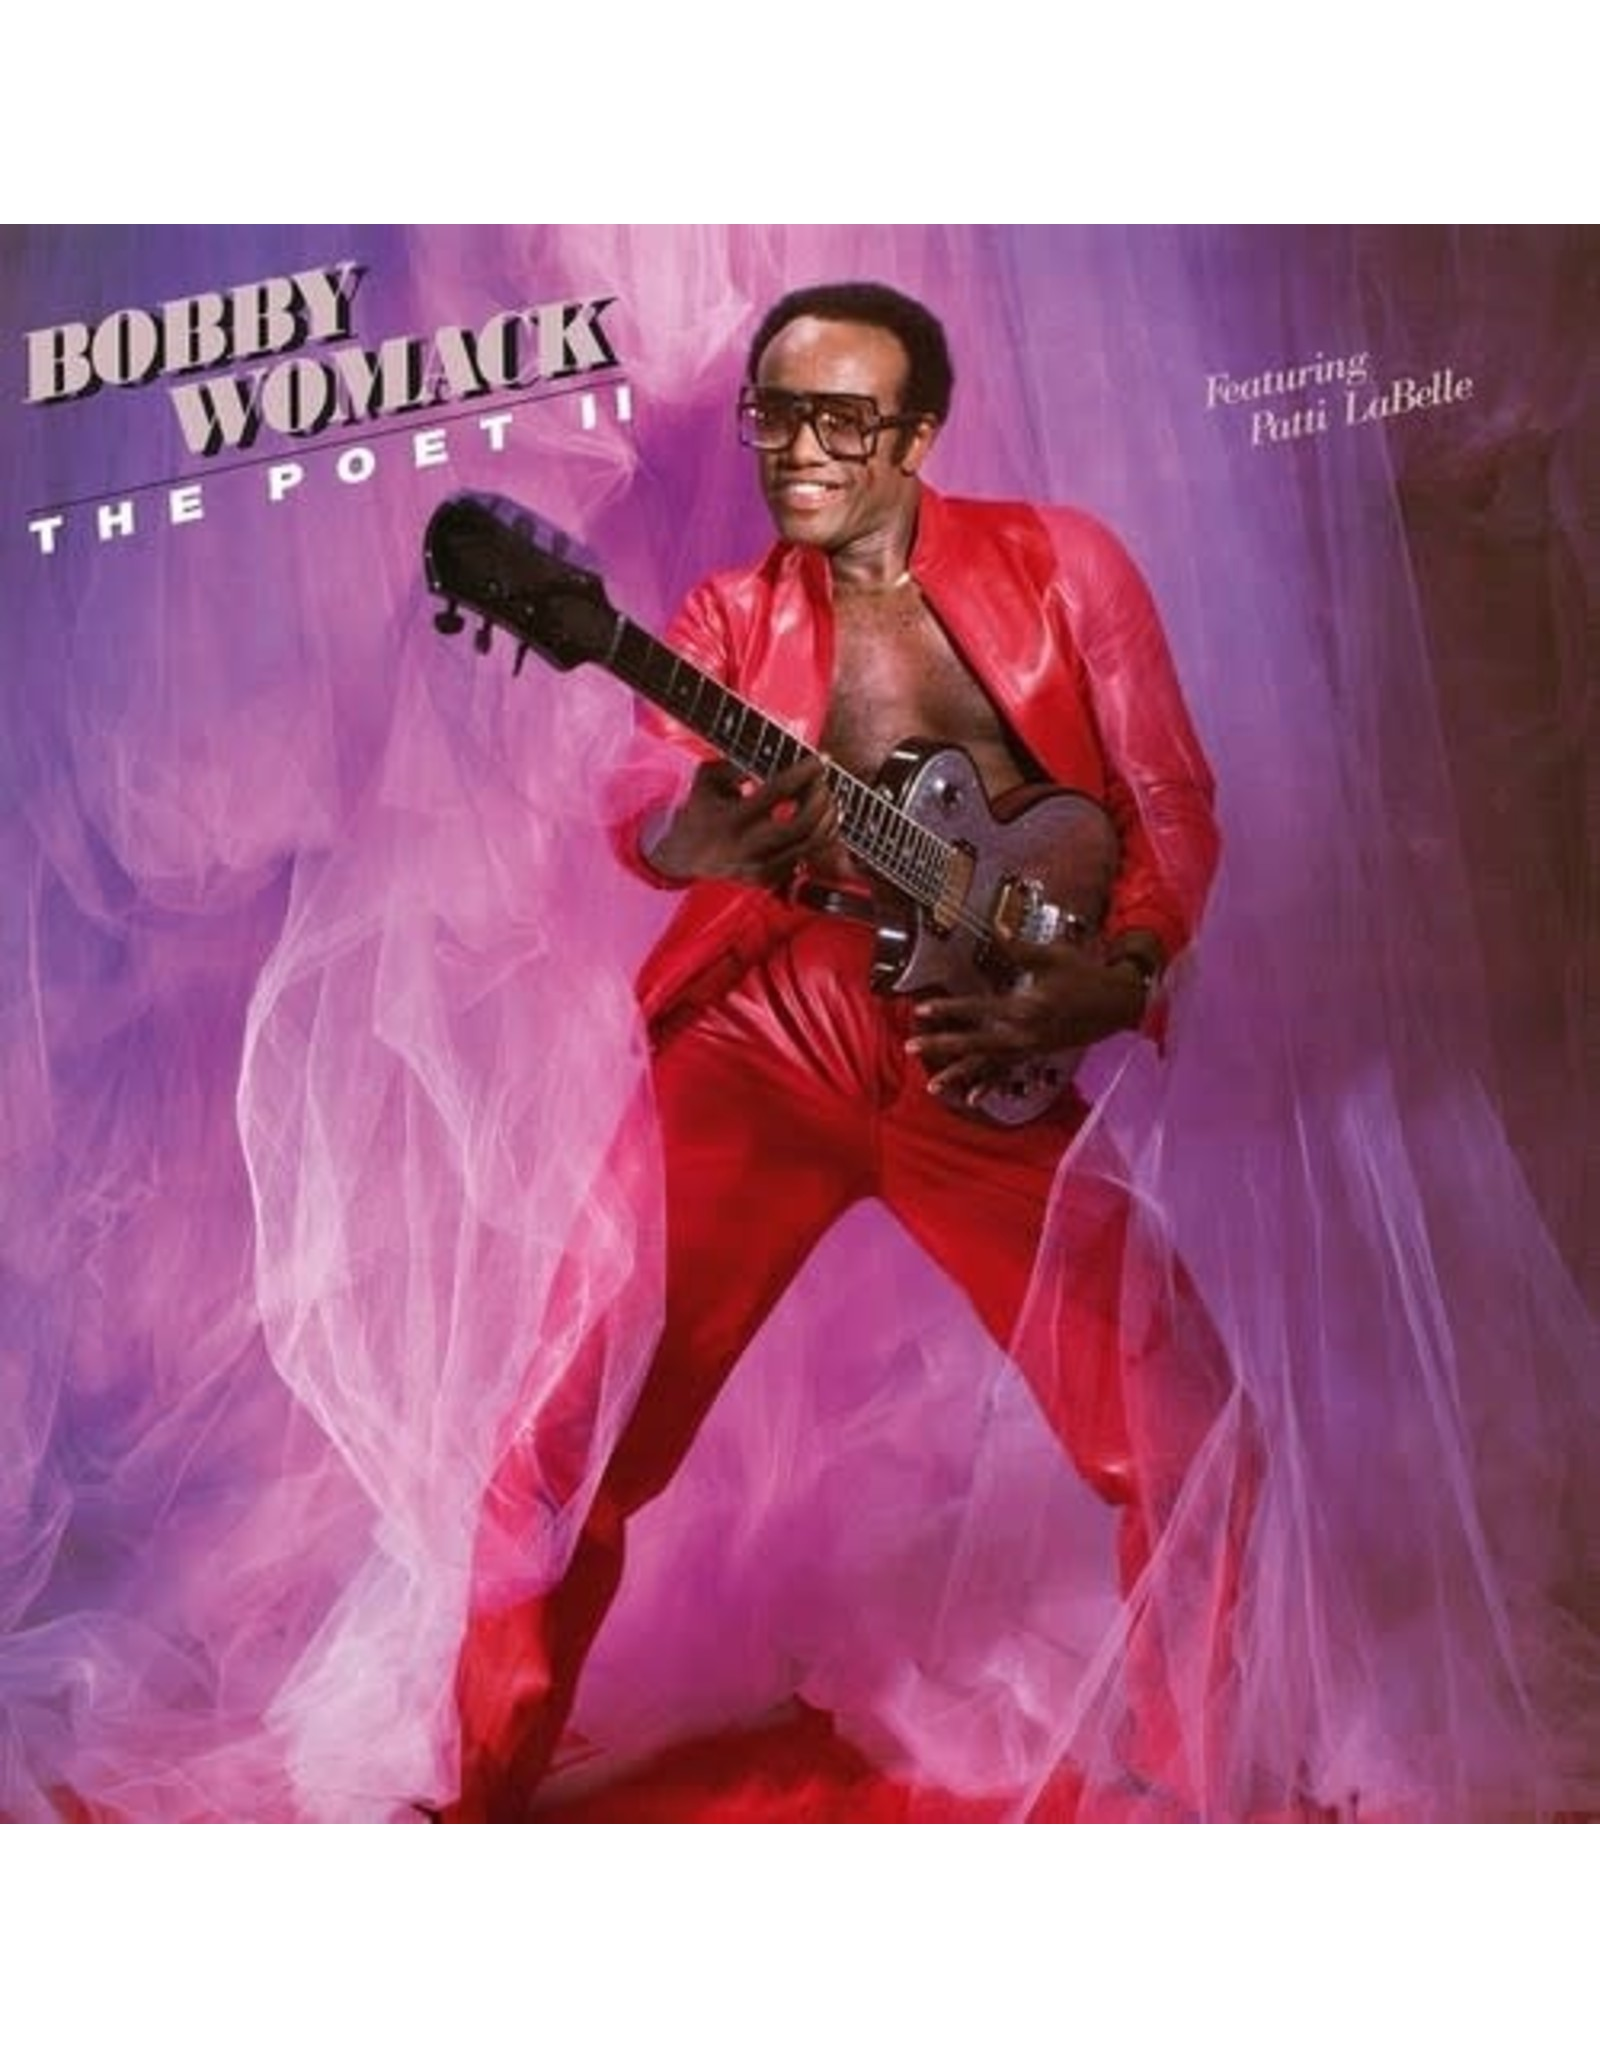 New Vinyl Bobby Womack - The Poet II LP